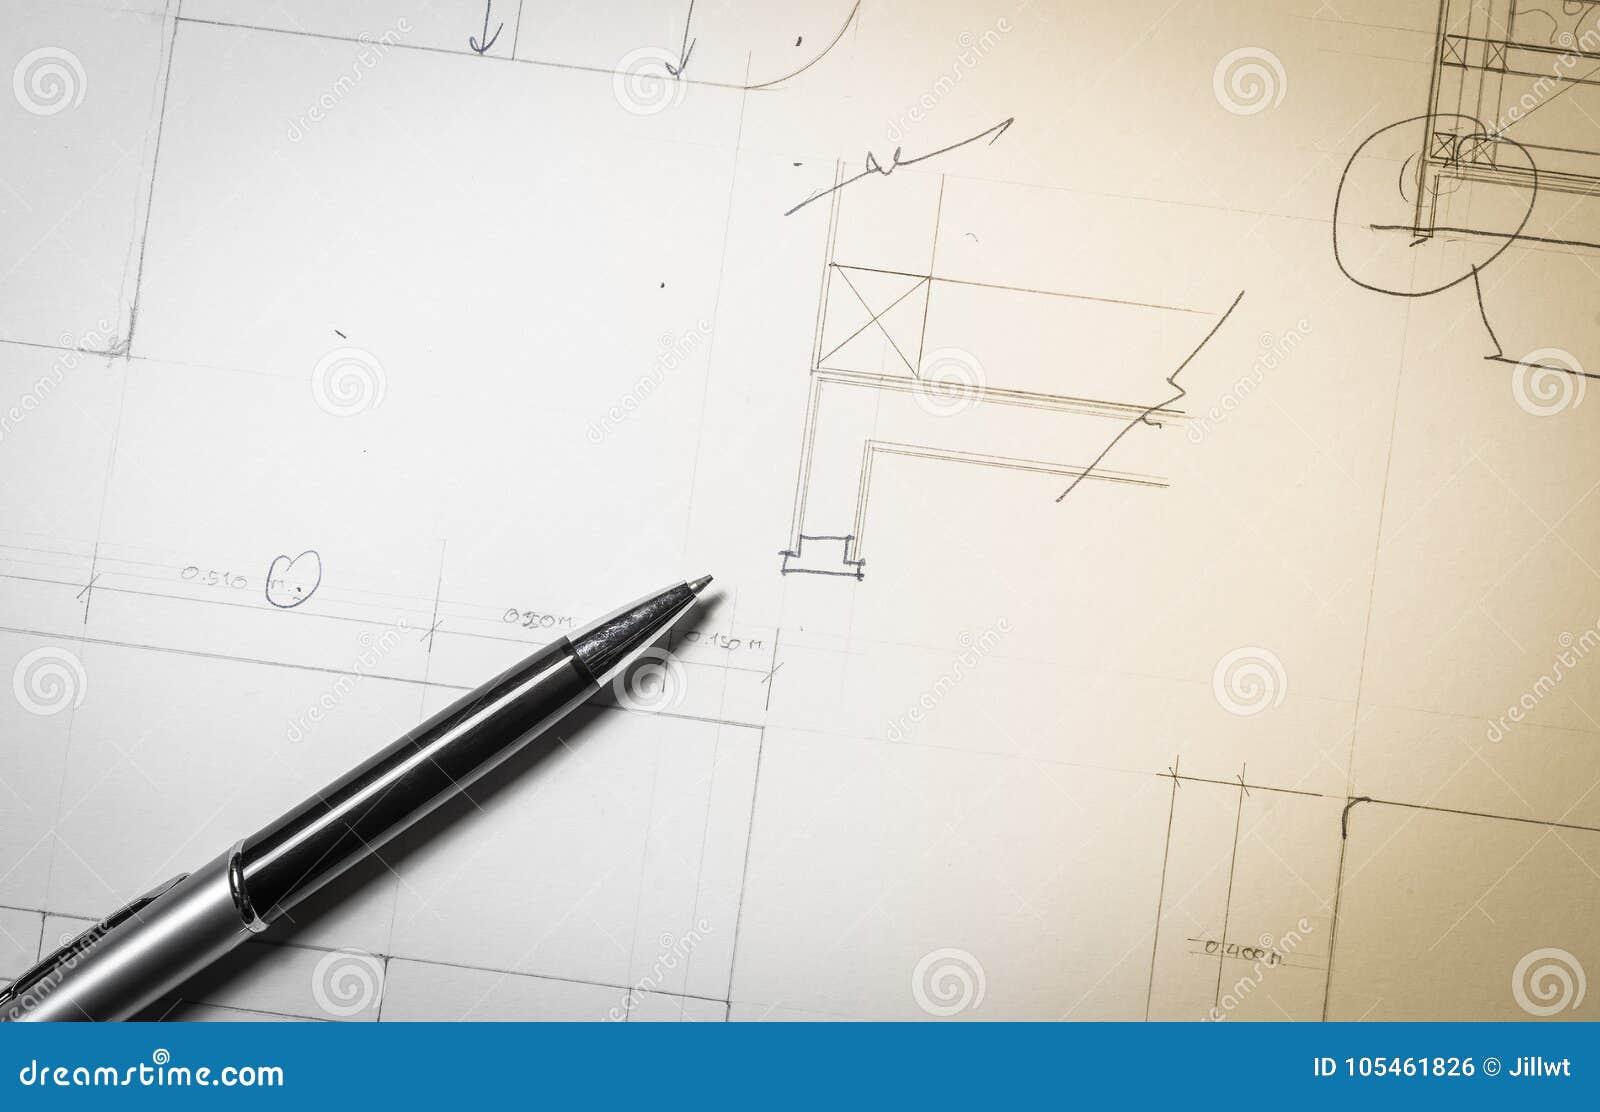 Work plan stock photo  Image of texture, tool, draw - 105461826